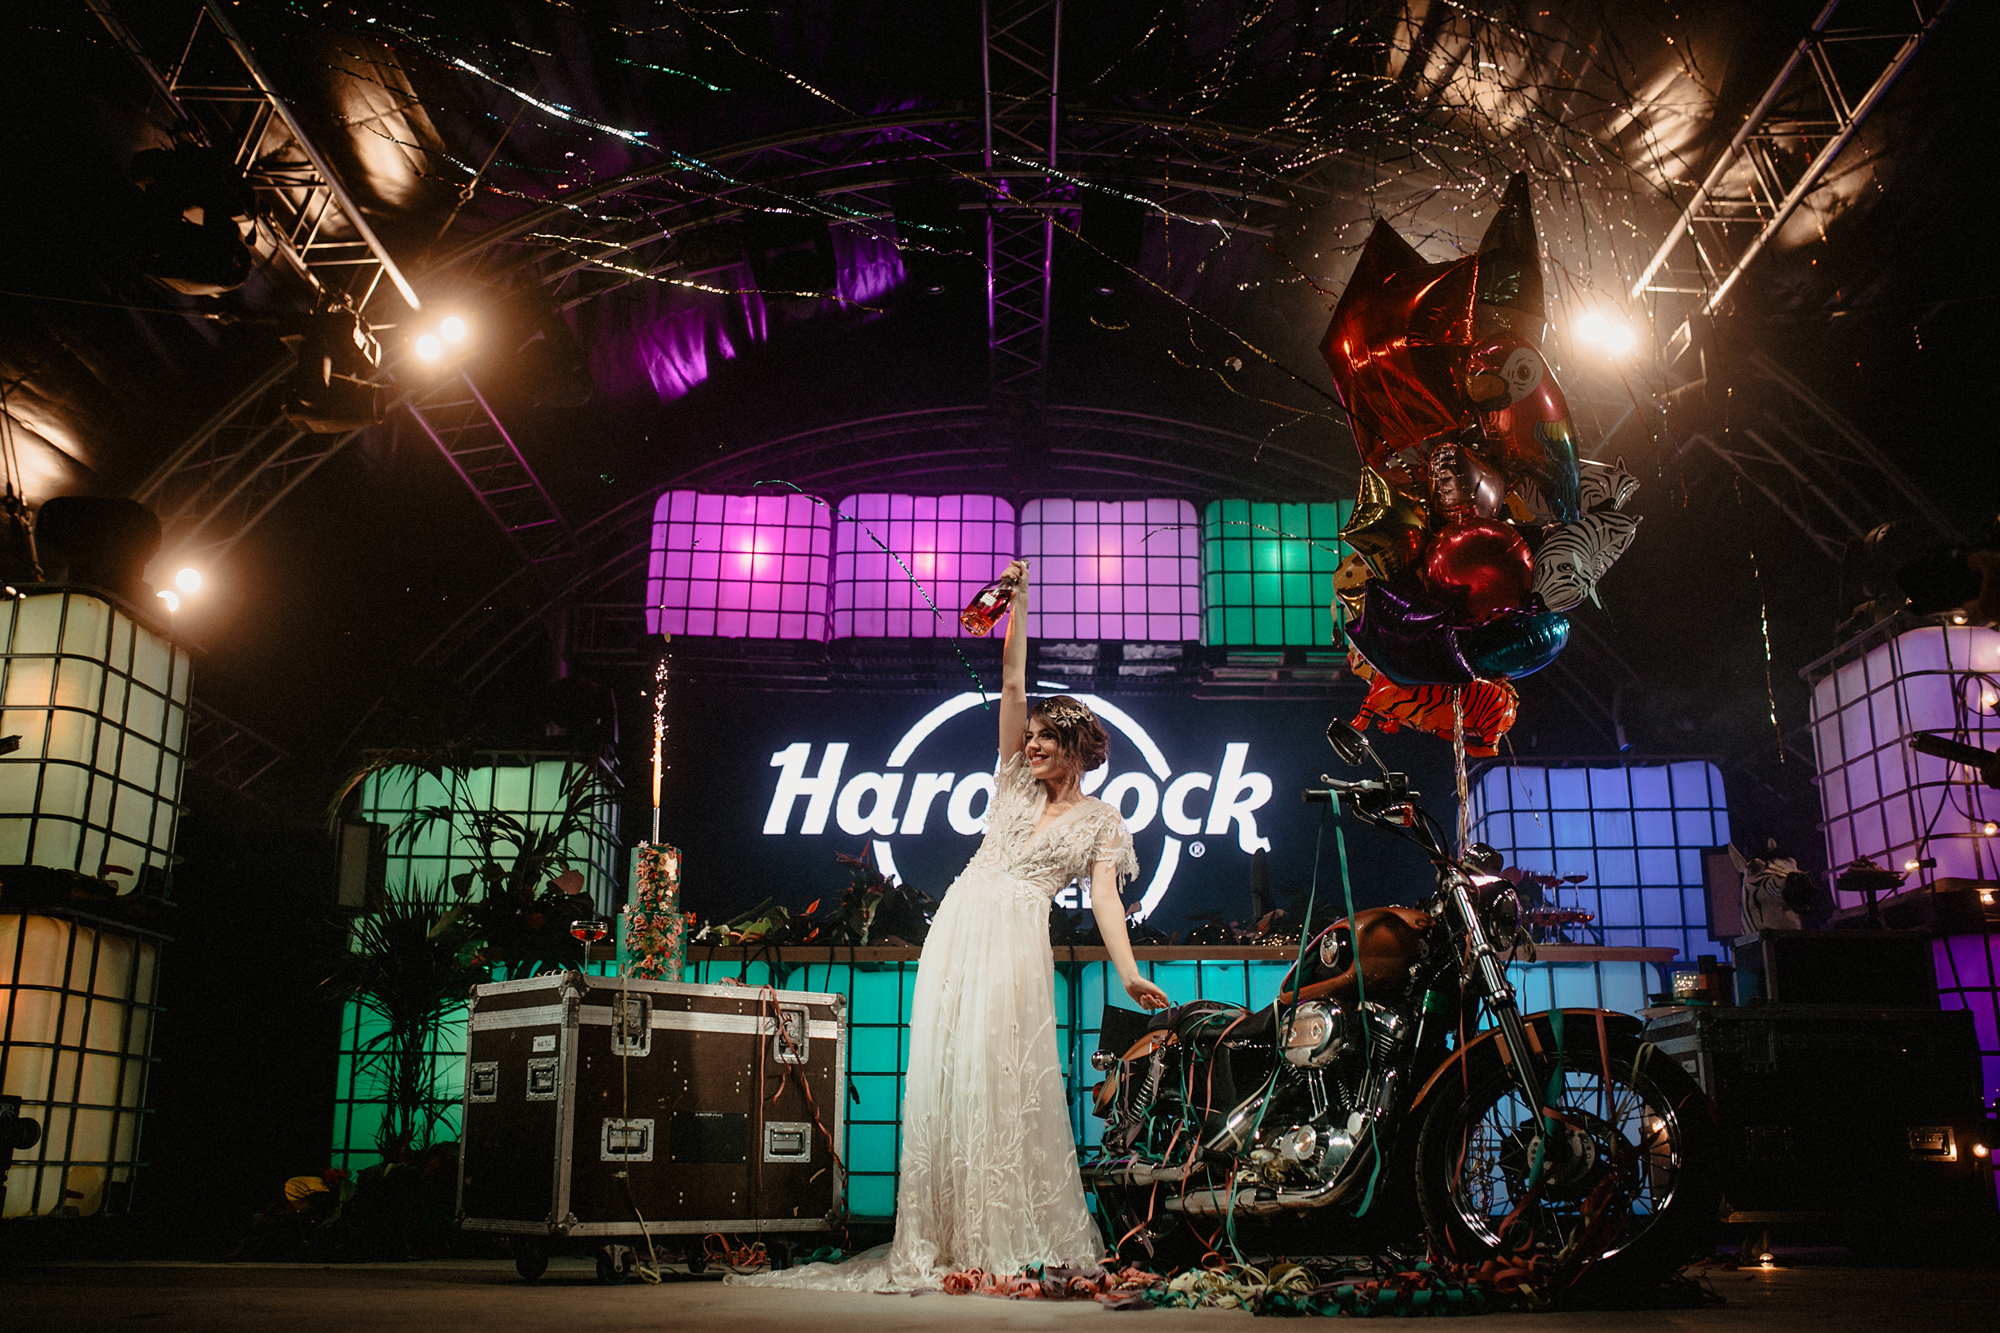 Hard Rock Hotel_wdc_moana086.jpg